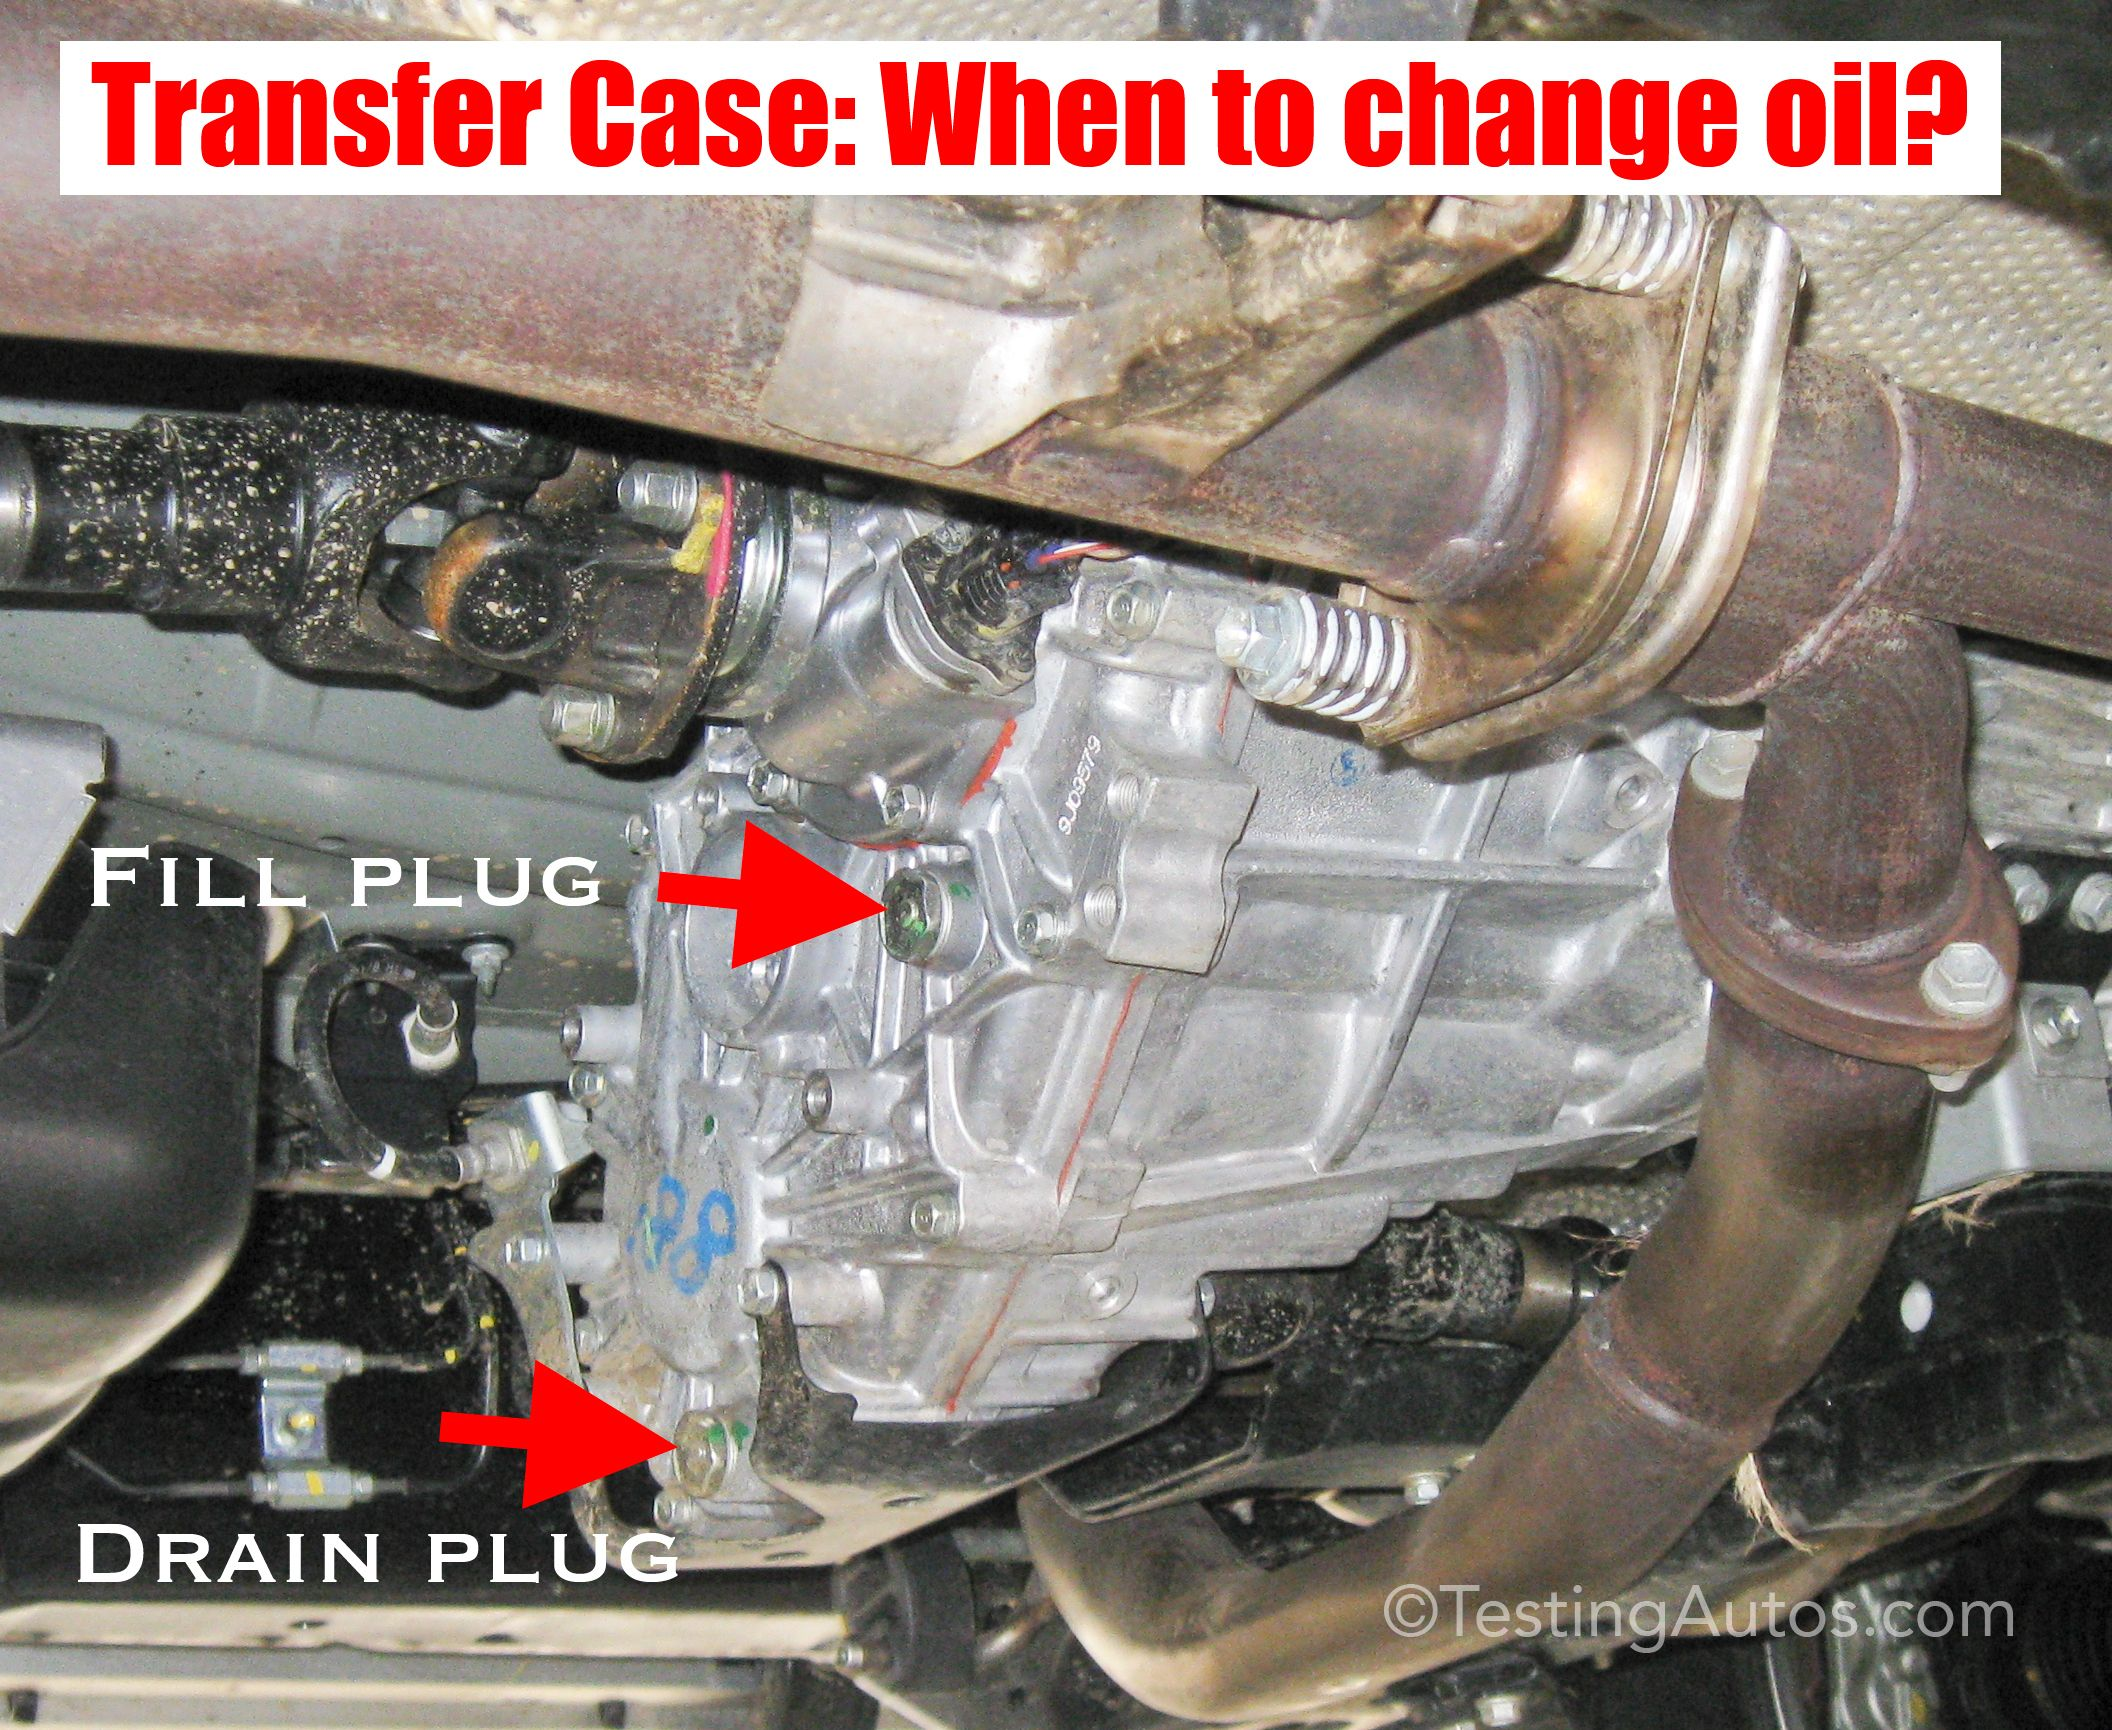 4wd transfer case when to change oil transfer case